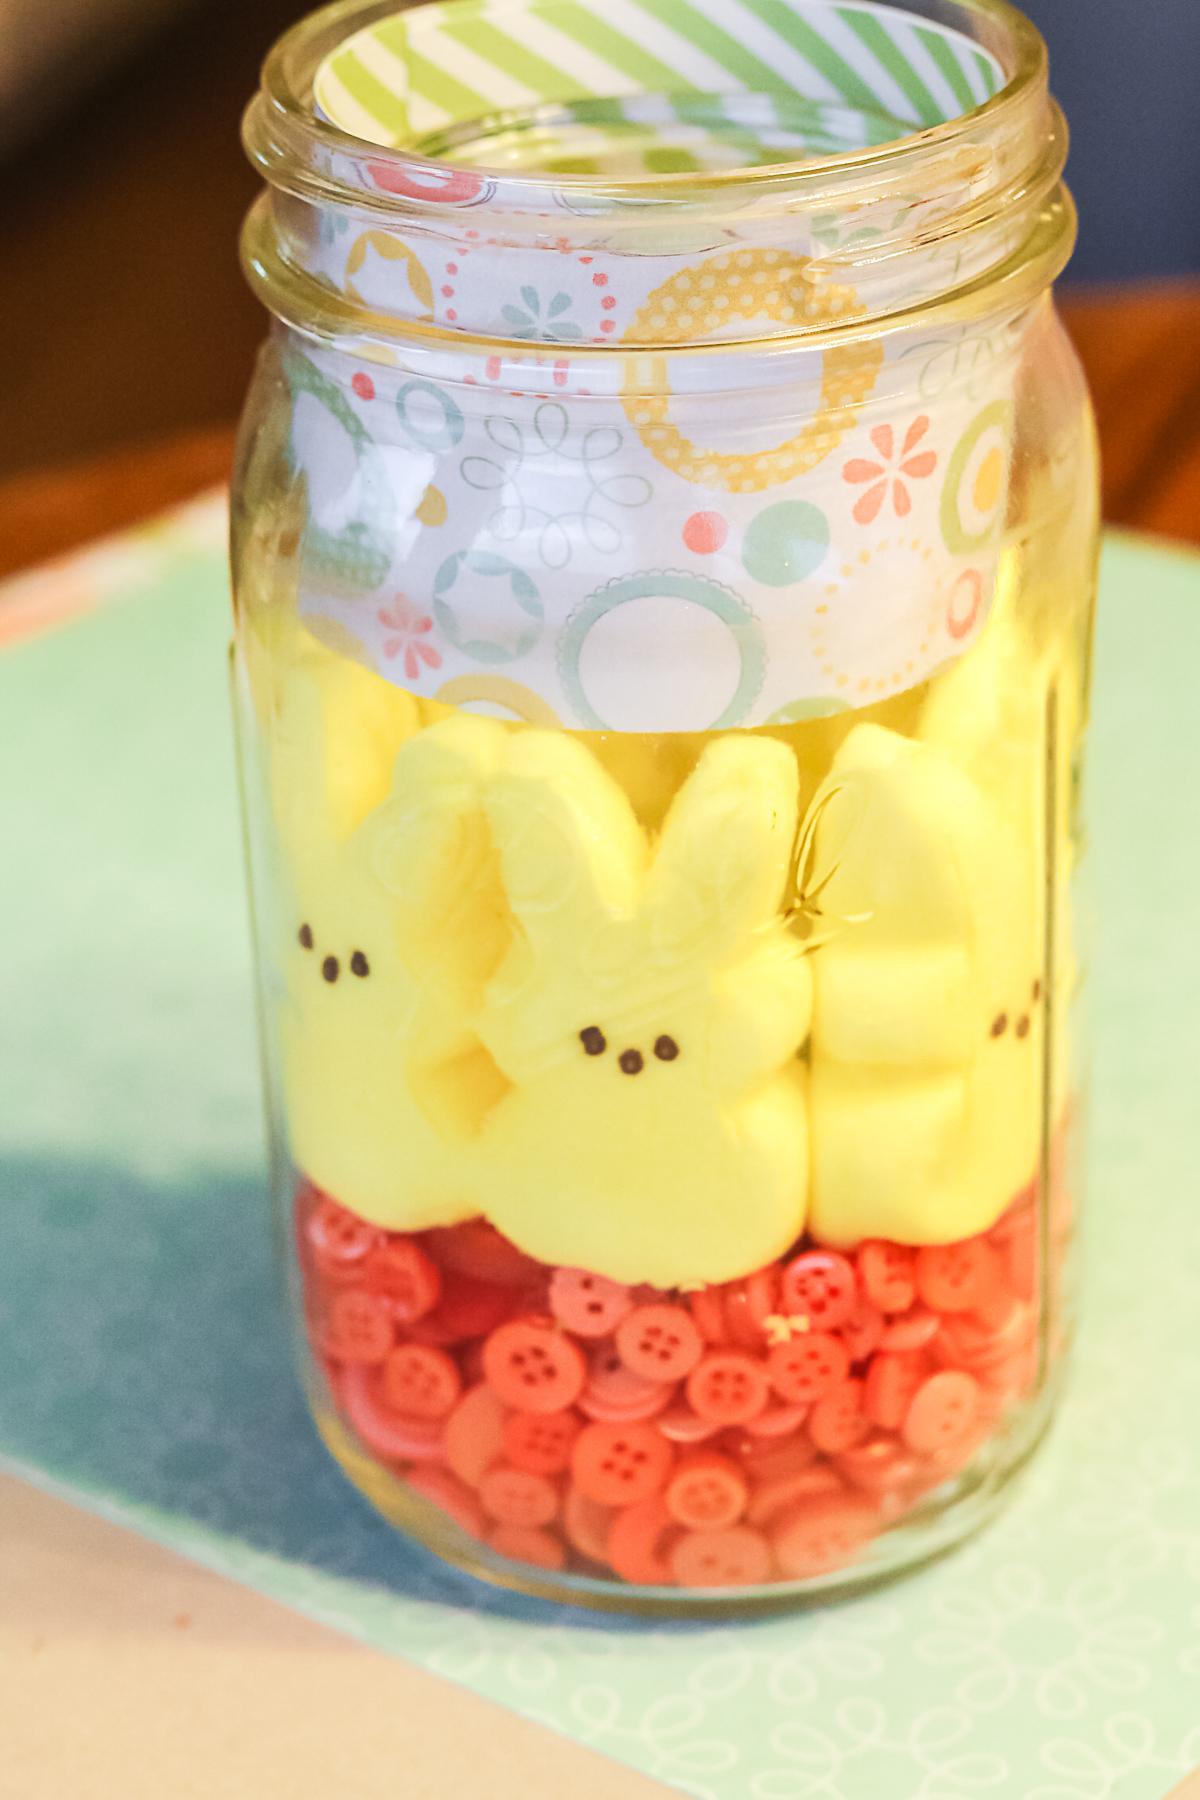 bunny-shaped peeps in a mason jar